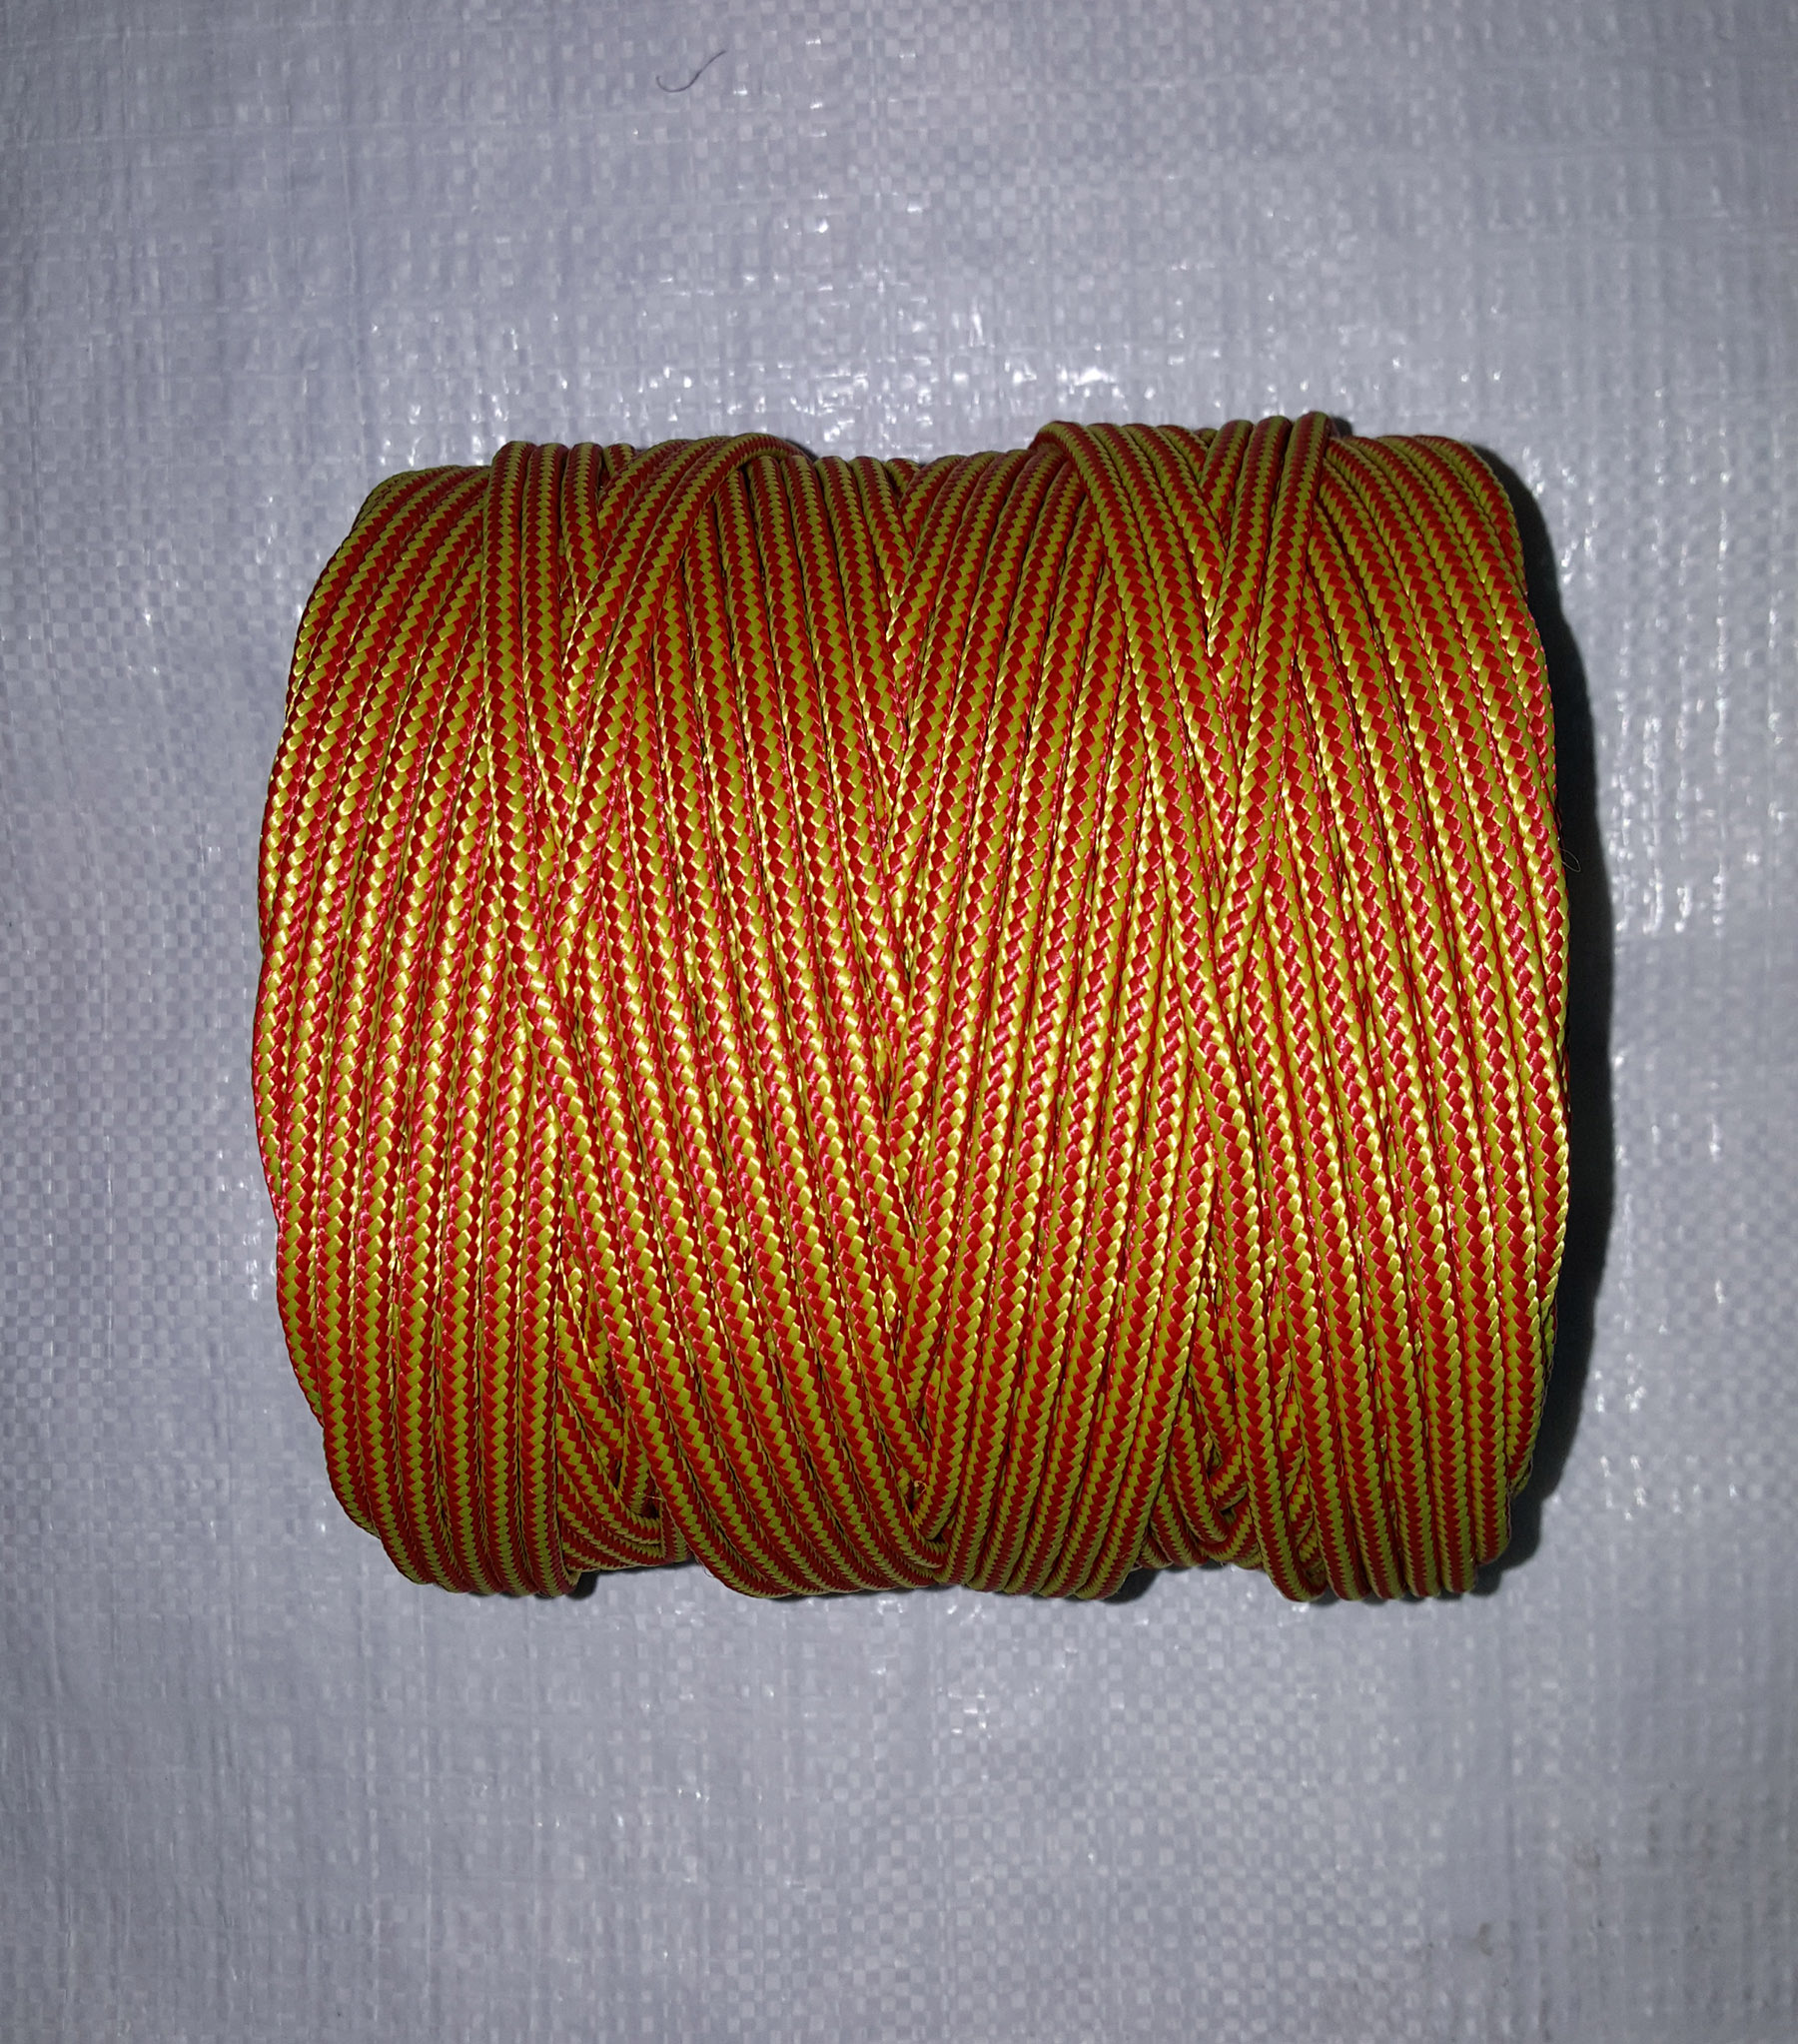 Mangas trenzadas multifilamento de nylon